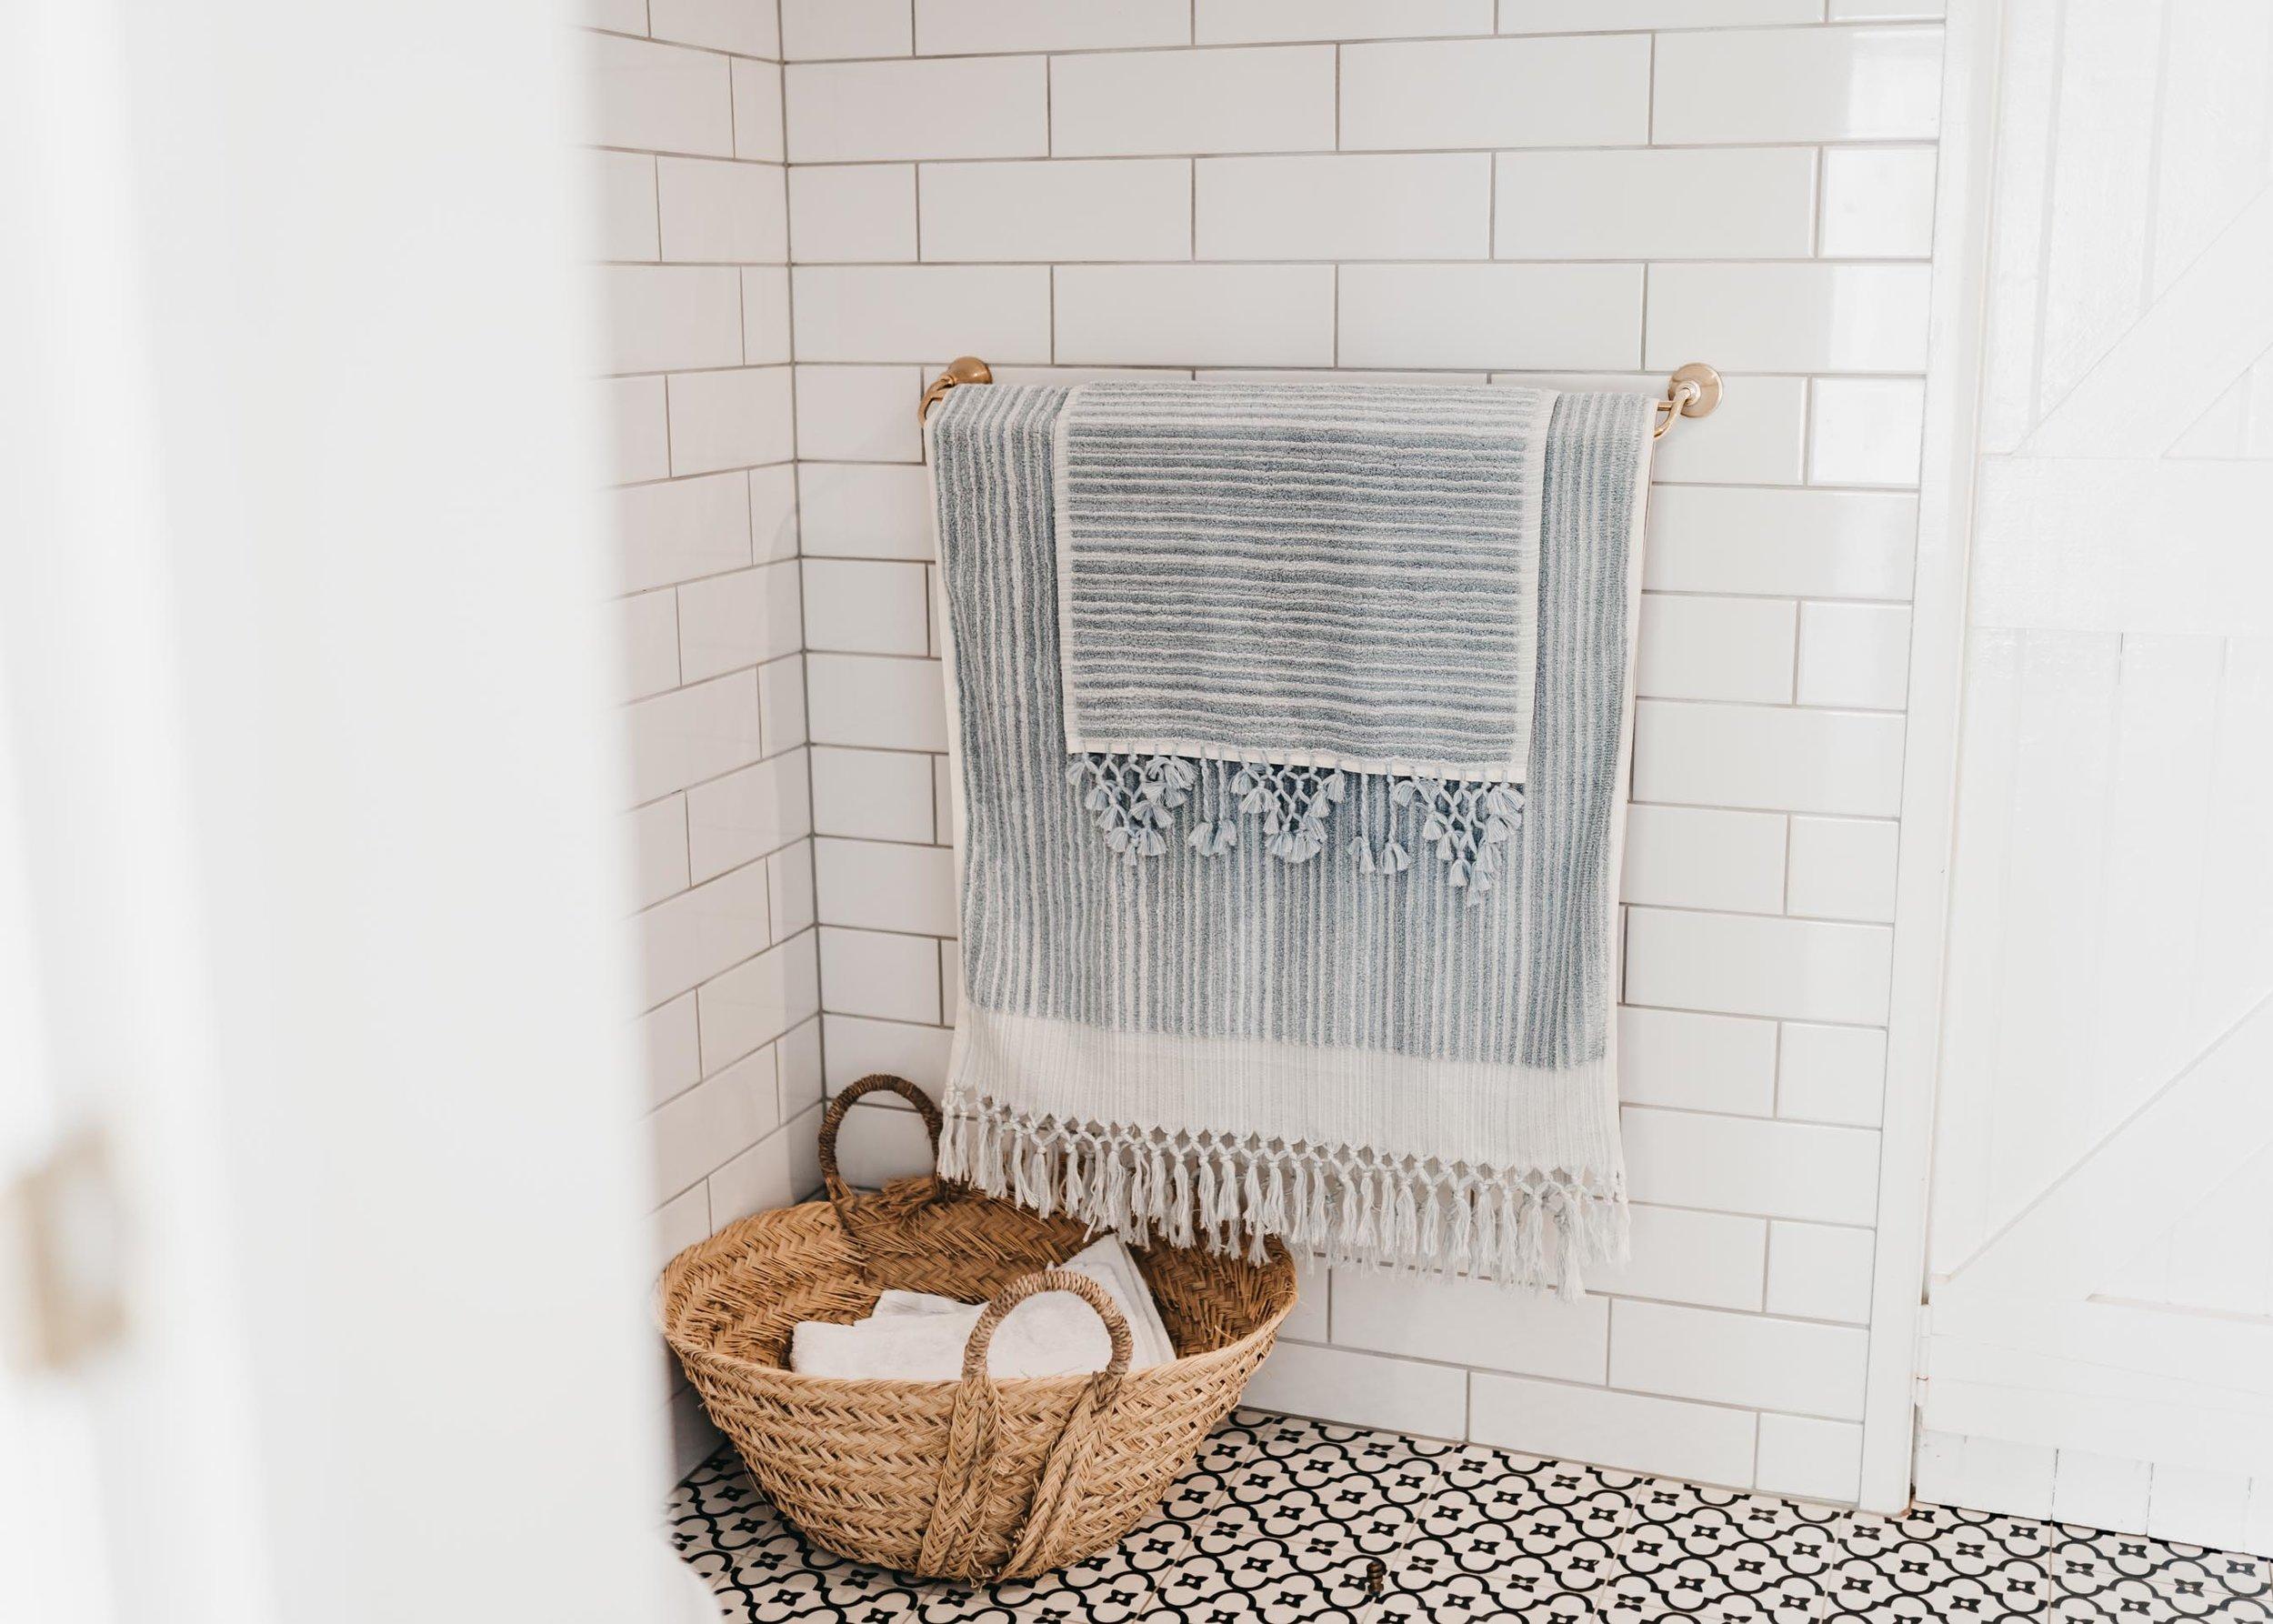 keira-mason-aegean-loom-blue-towels-in-bathroom.jpg